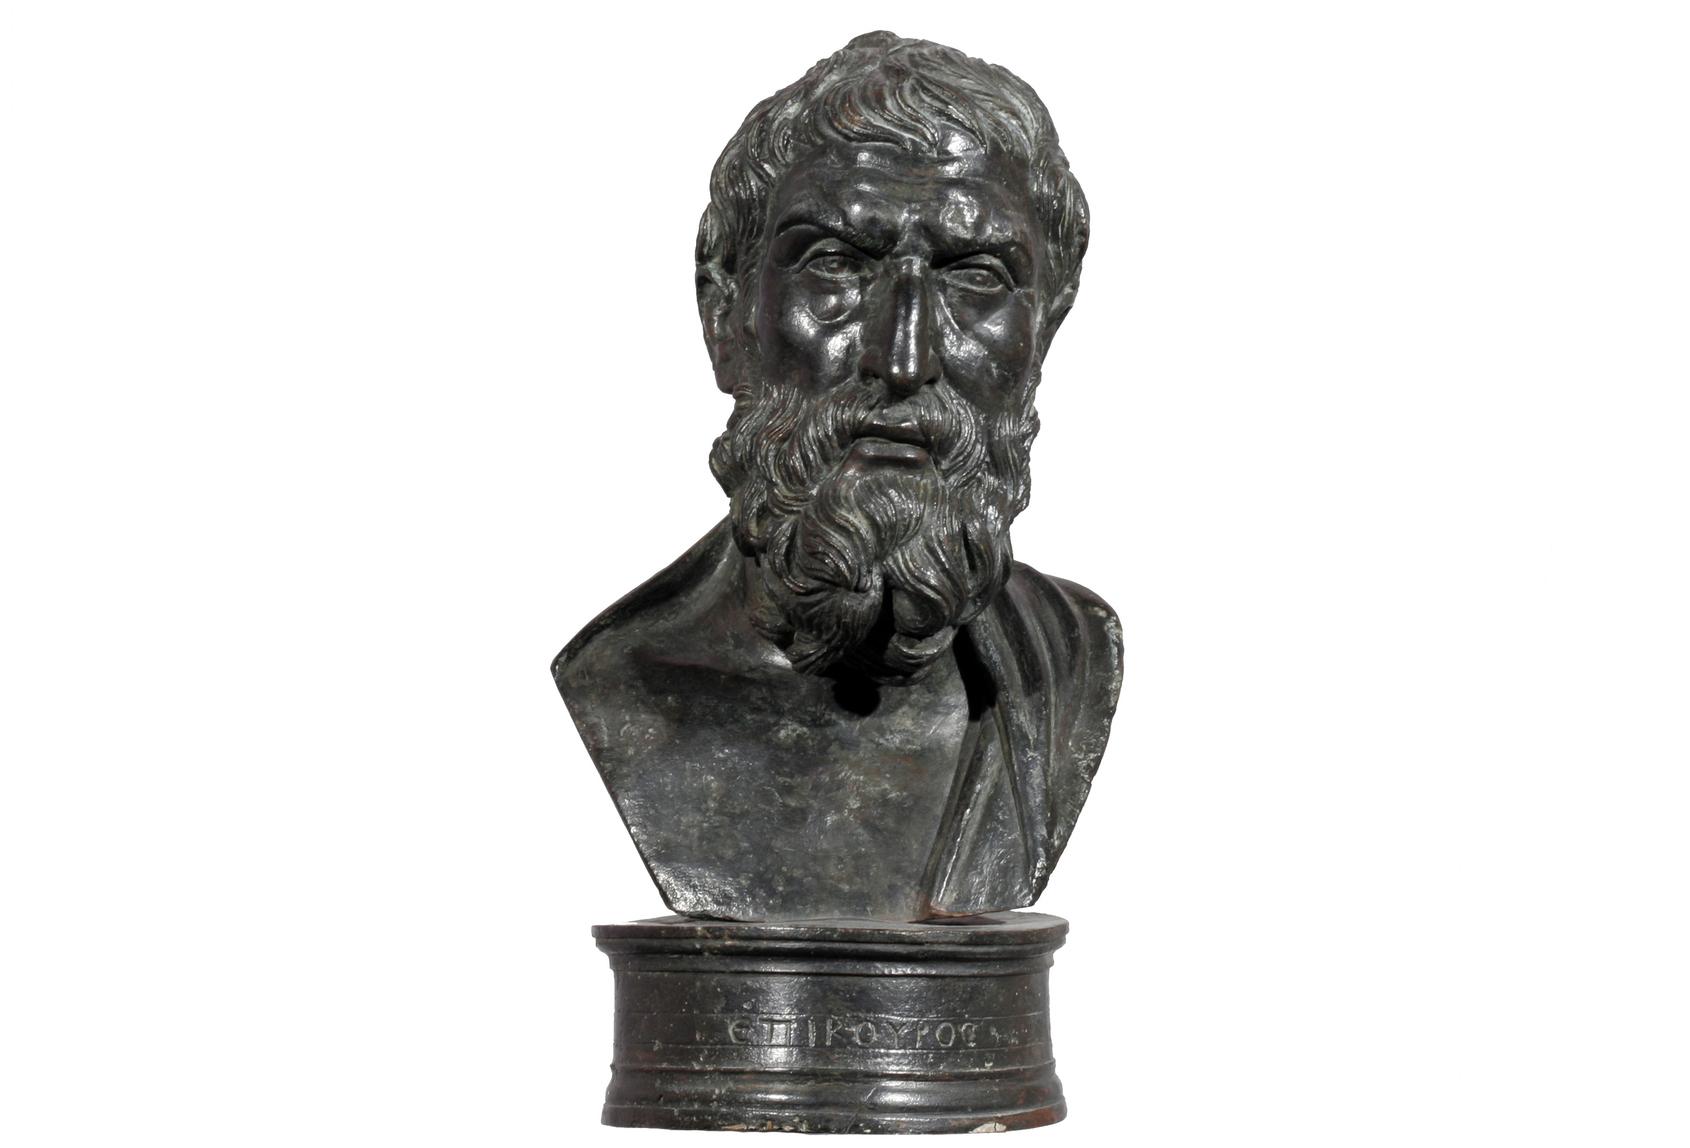 Small Bust o Epikouros, 1st century BC-1st century AD, Roman, Bronze, 12cm plus base 20.3 cm high courtesy Museo Archeologico Nazionale di Napoli, Photo Giorgio Albano